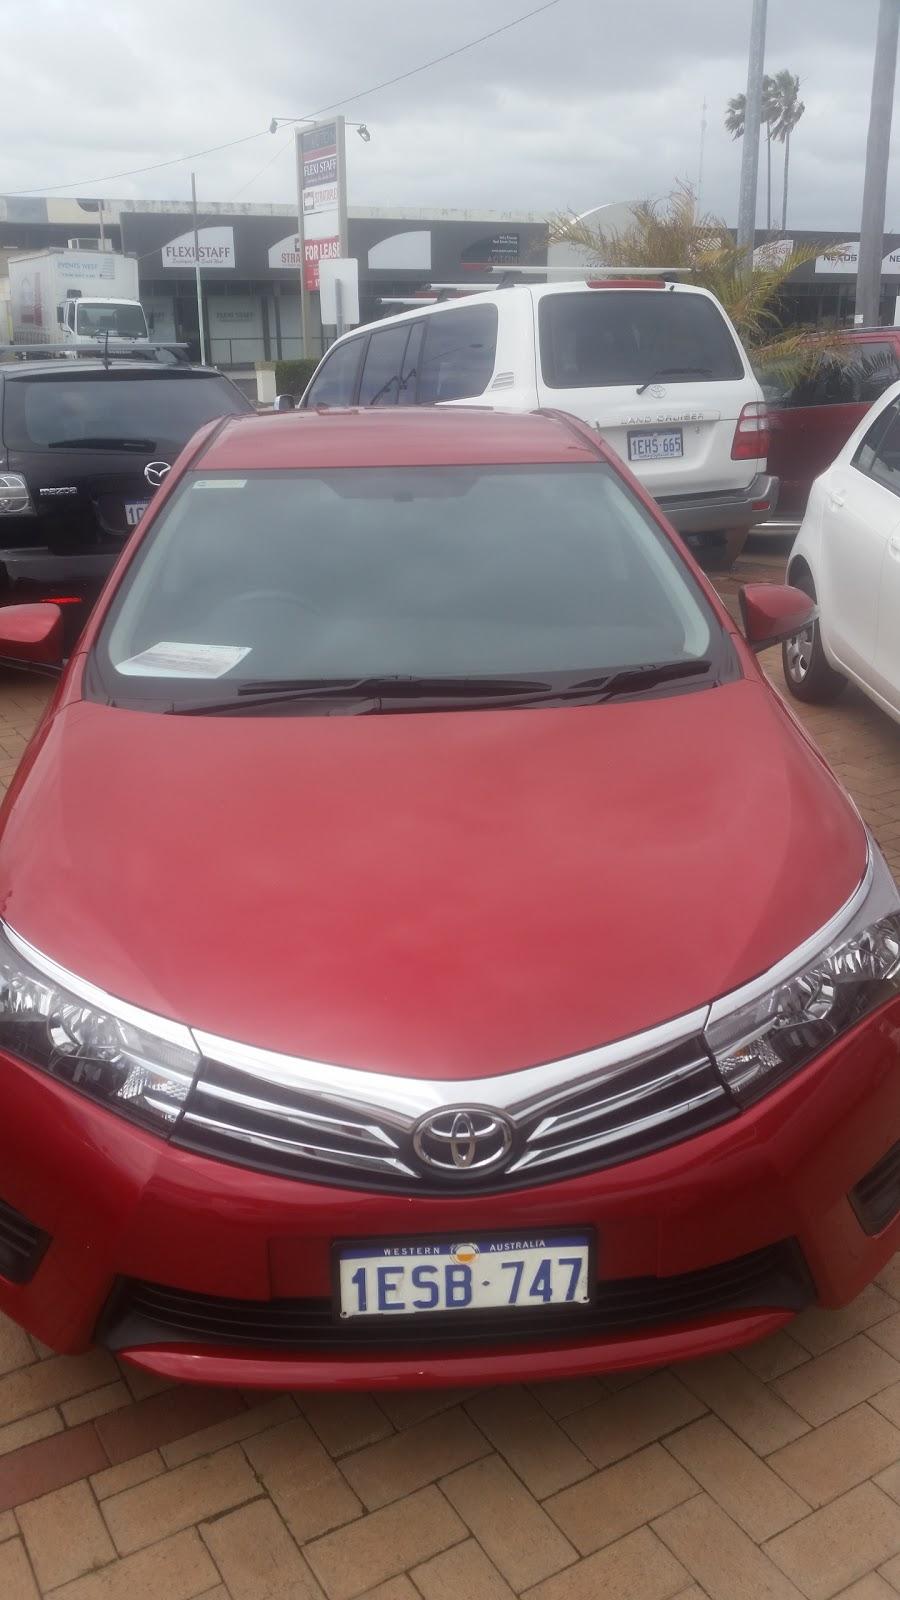 Bunbury Toyota | car dealer | 34 Spencer St, Bunbury WA 6230, Australia | 0897222333 OR +61 8 9722 2333